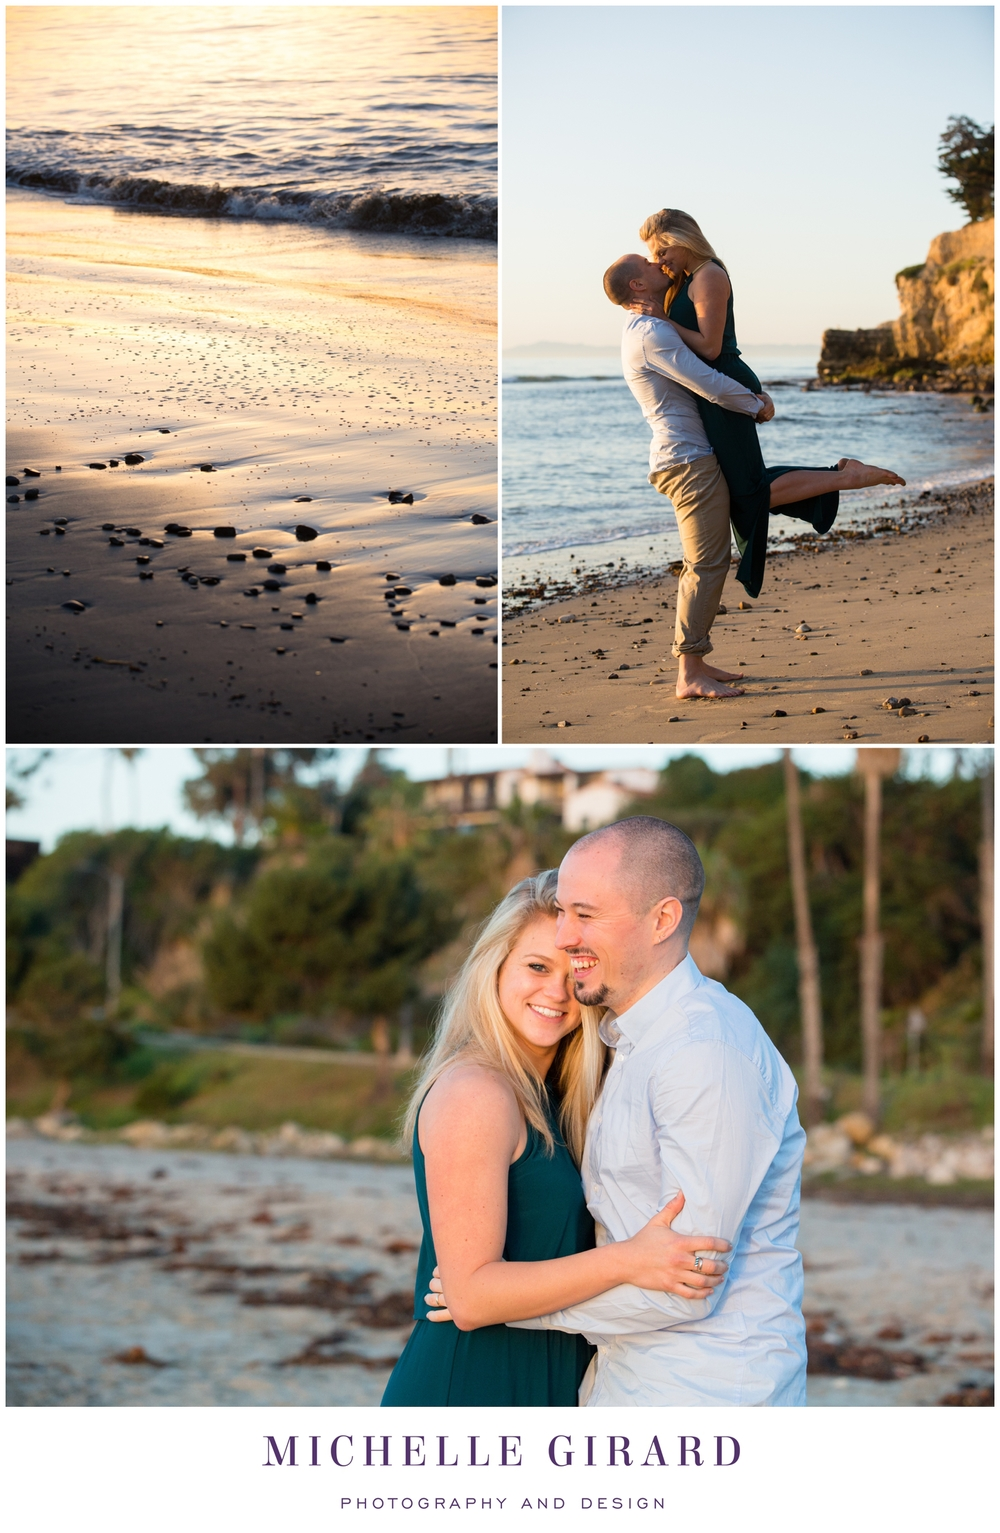 santa-barbara-california-engagement-photography-sunrise-theater-beach-michelle-girard03.jpg